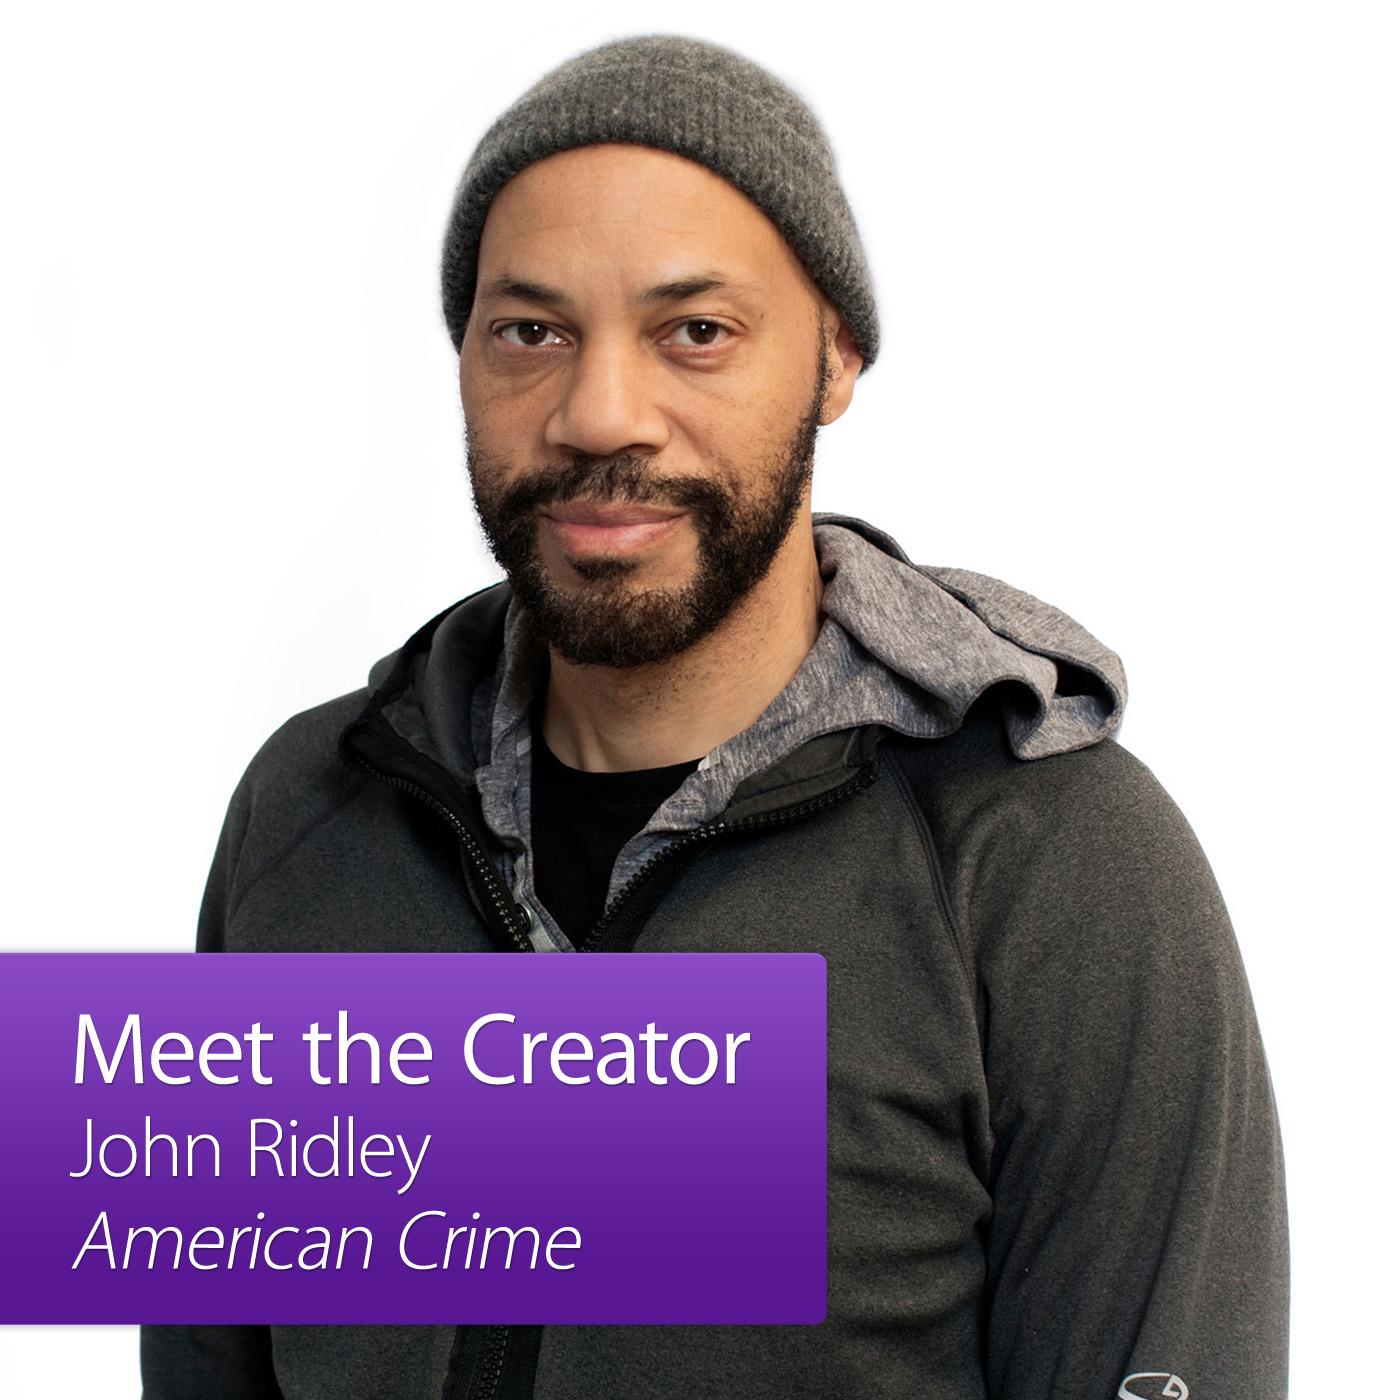 American Crime: Meet The Creator